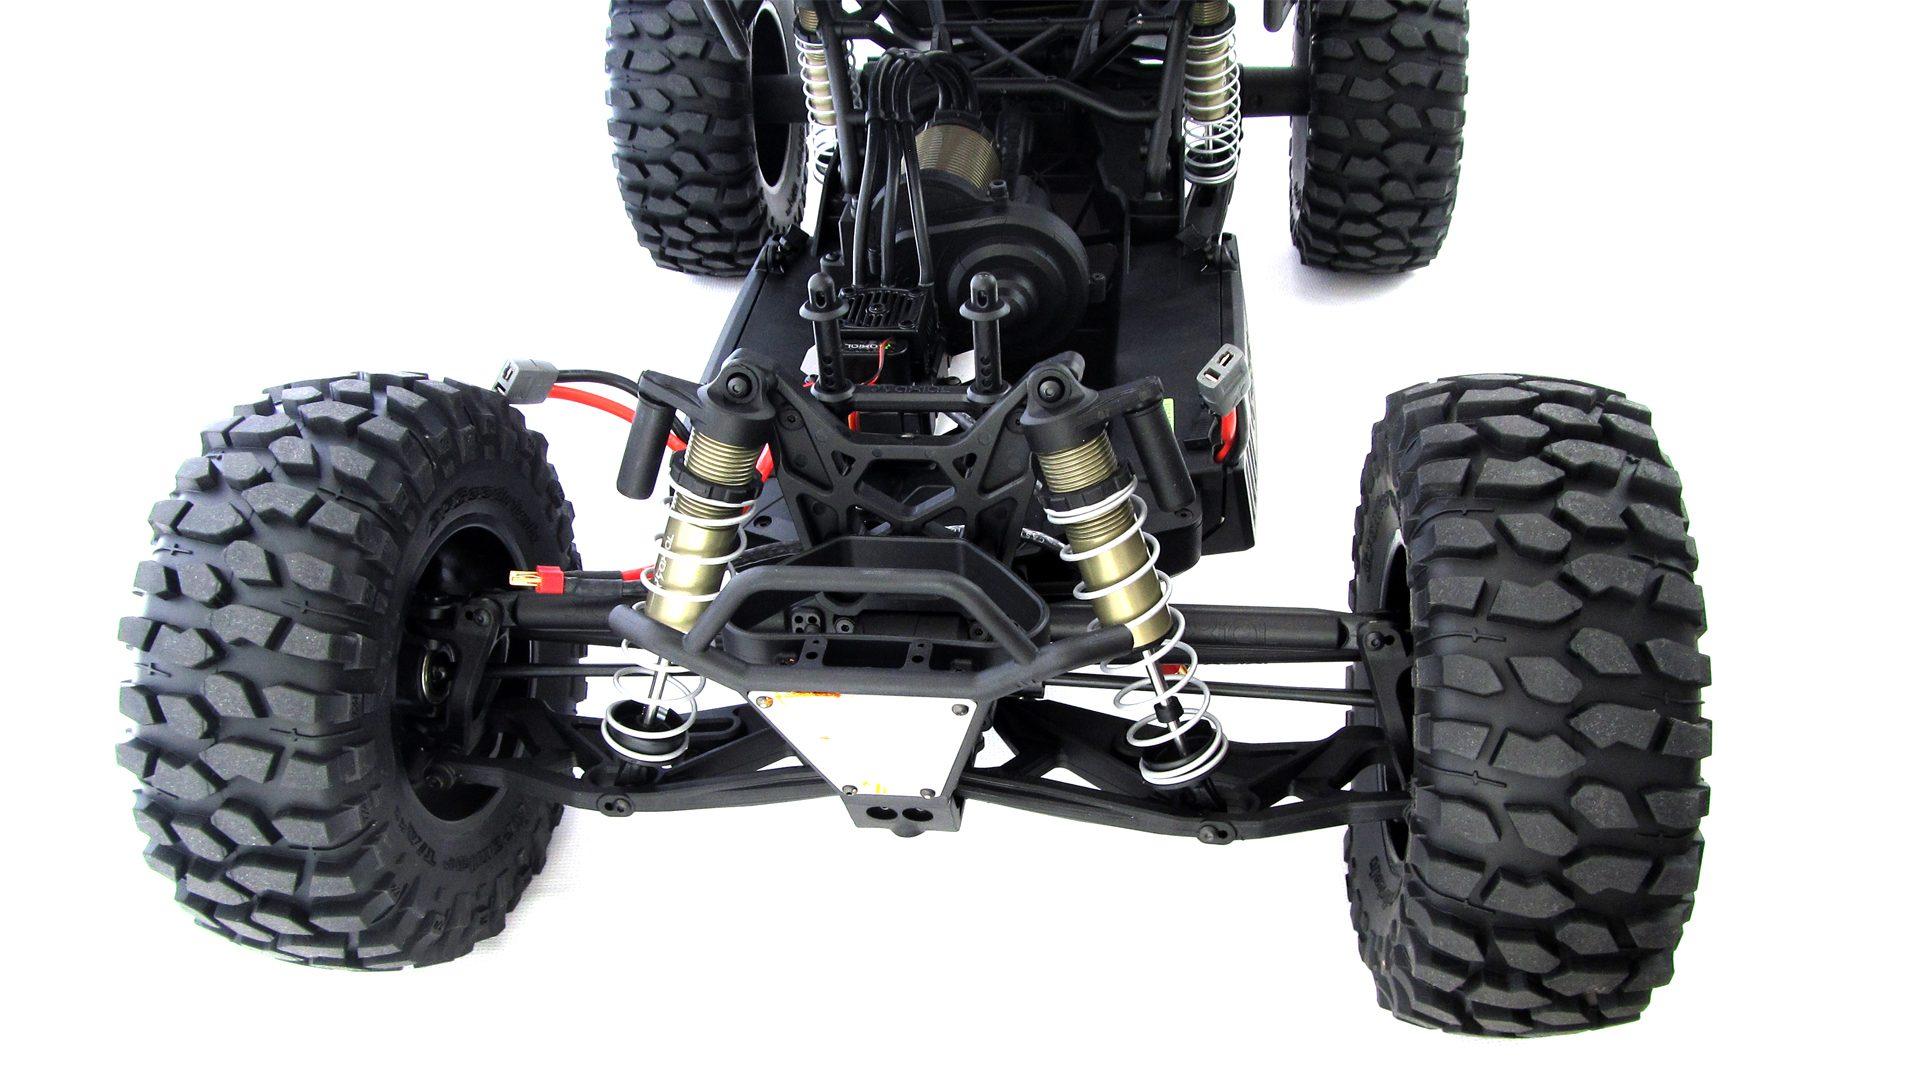 Yeti-Reifen-Motor-Aufhaengung_8